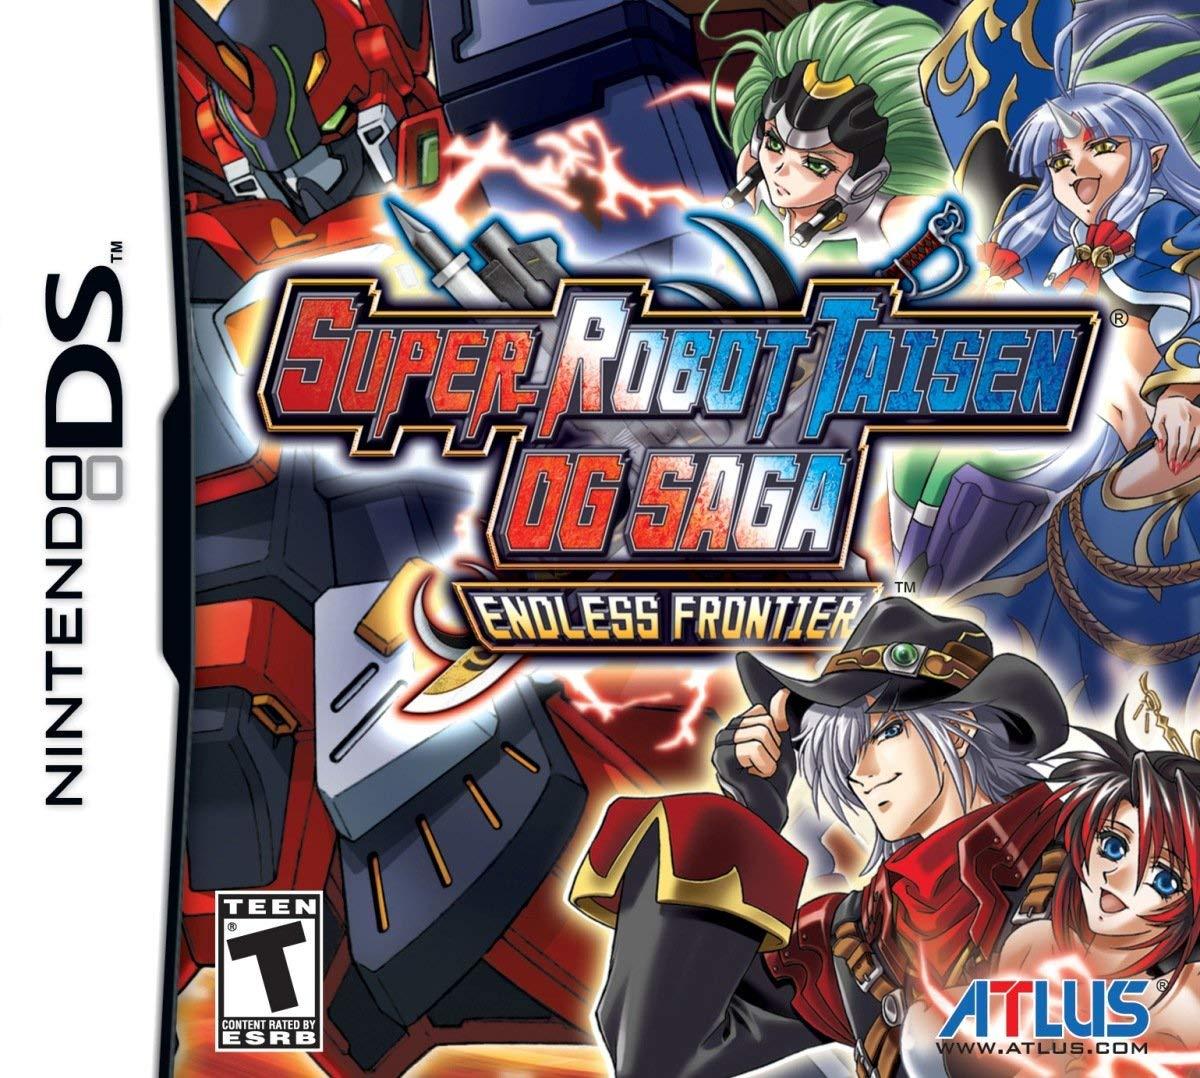 Super Robot Taisen OG Saga: Endless Frontier - Nintendo DS (Renewed)